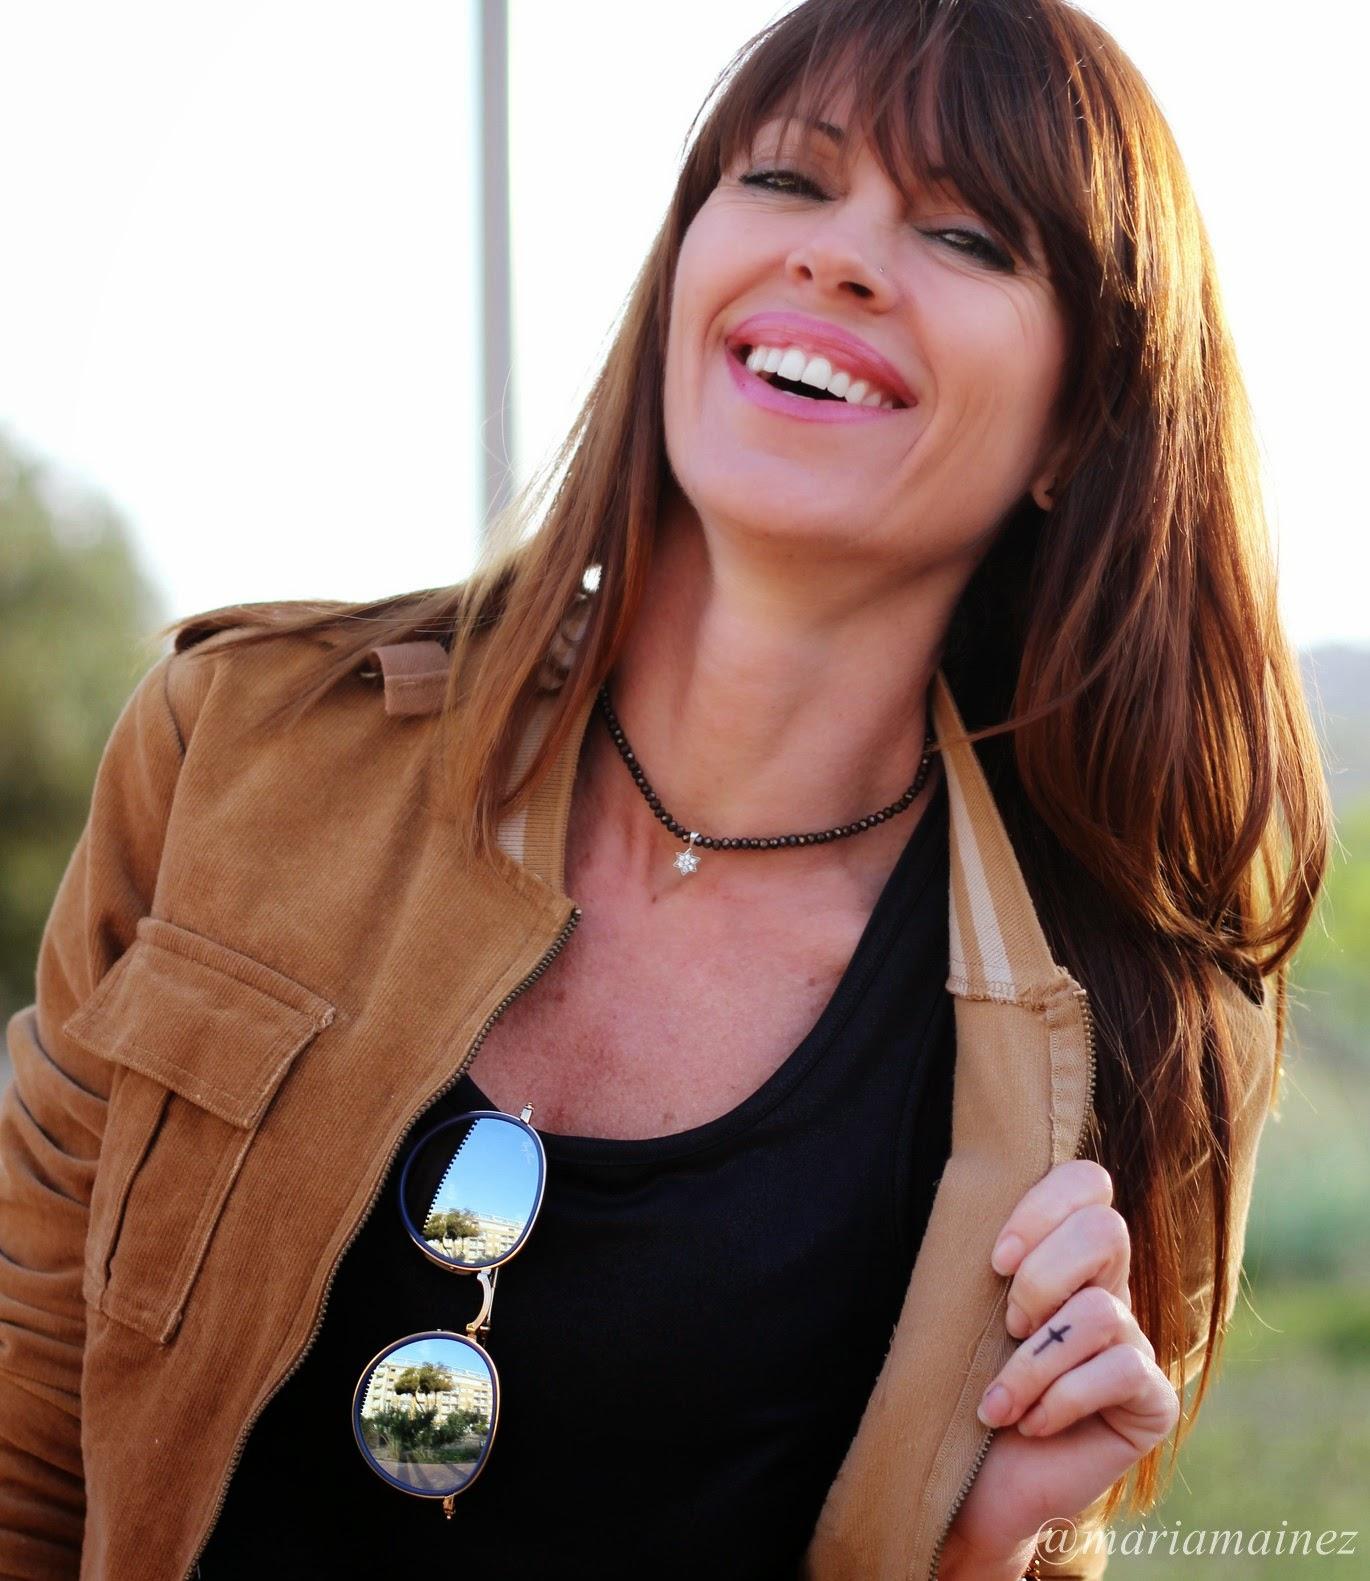 Falda larga - Colores tierra - Hippie chic - fashion blogger - Cuchicuchi joyas